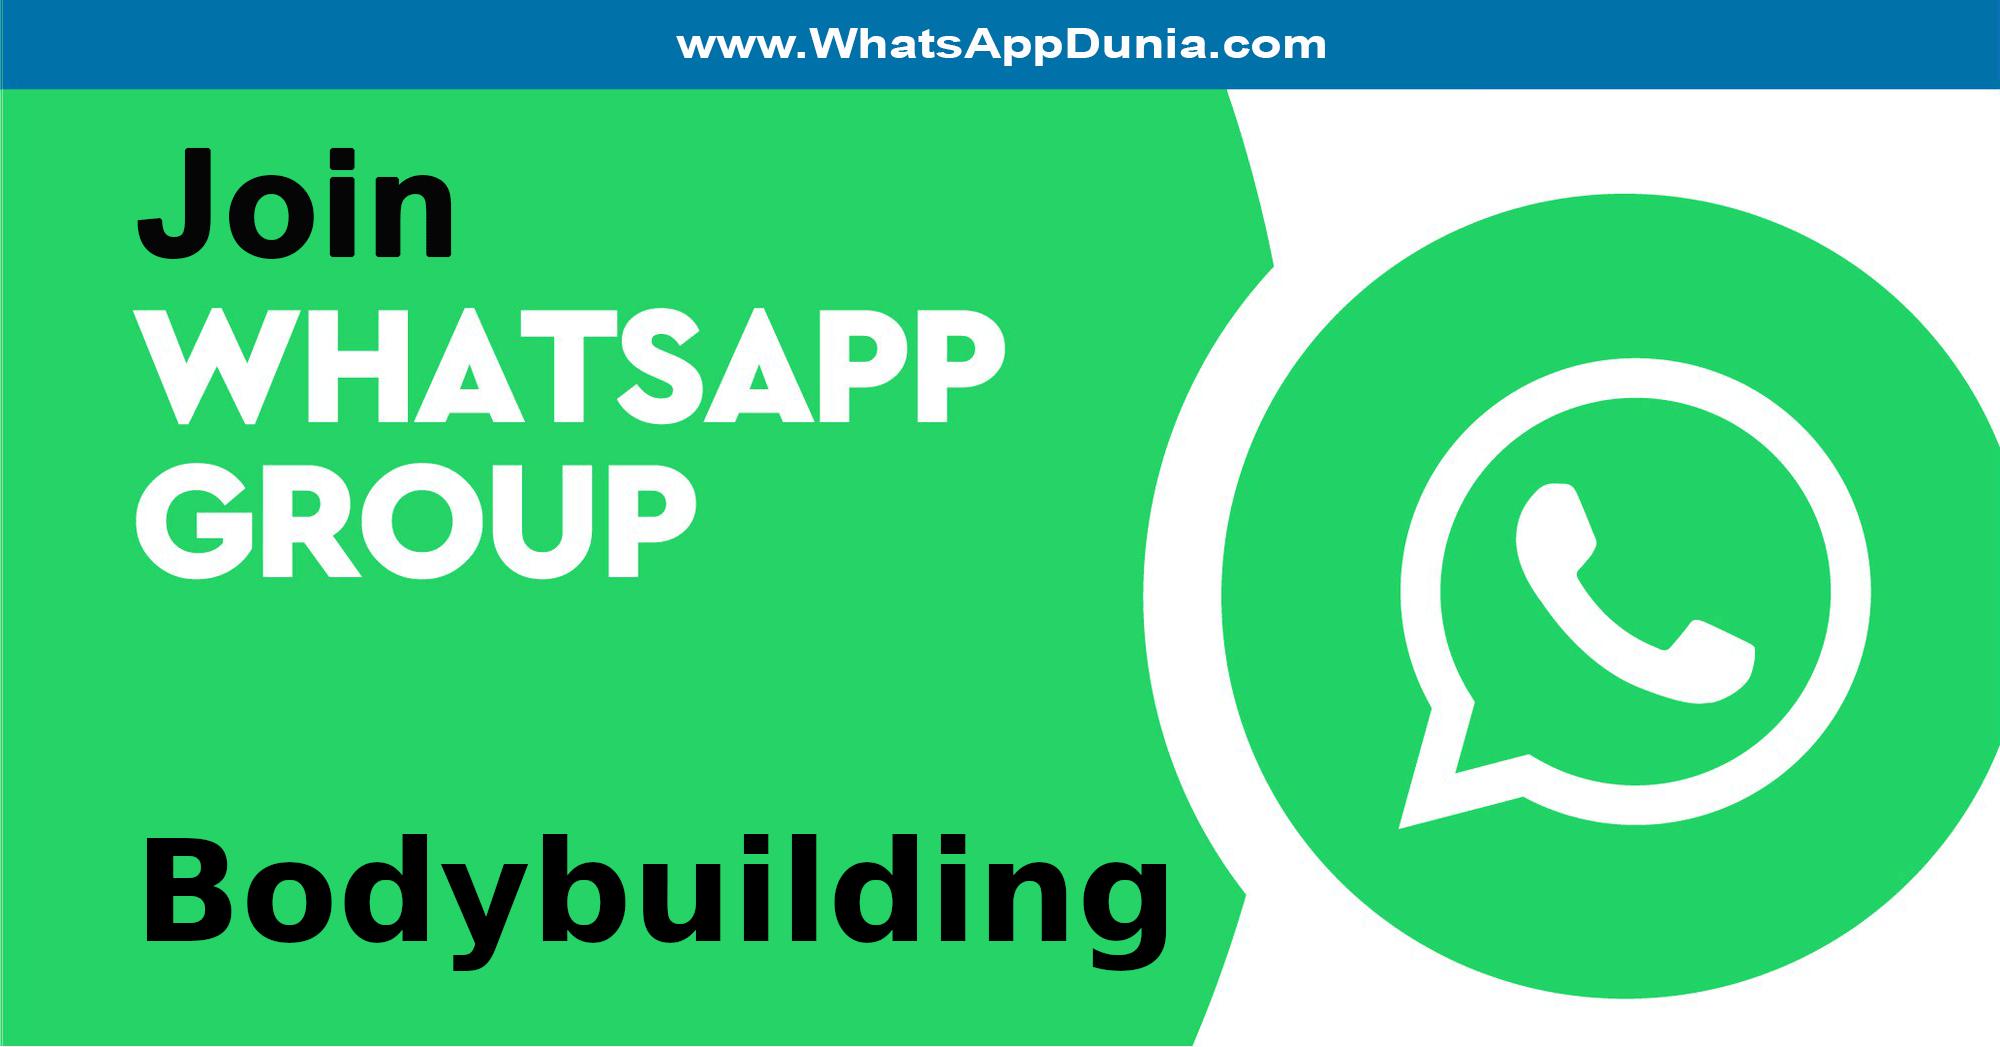 Bodybuilding WhatsApp Group Links